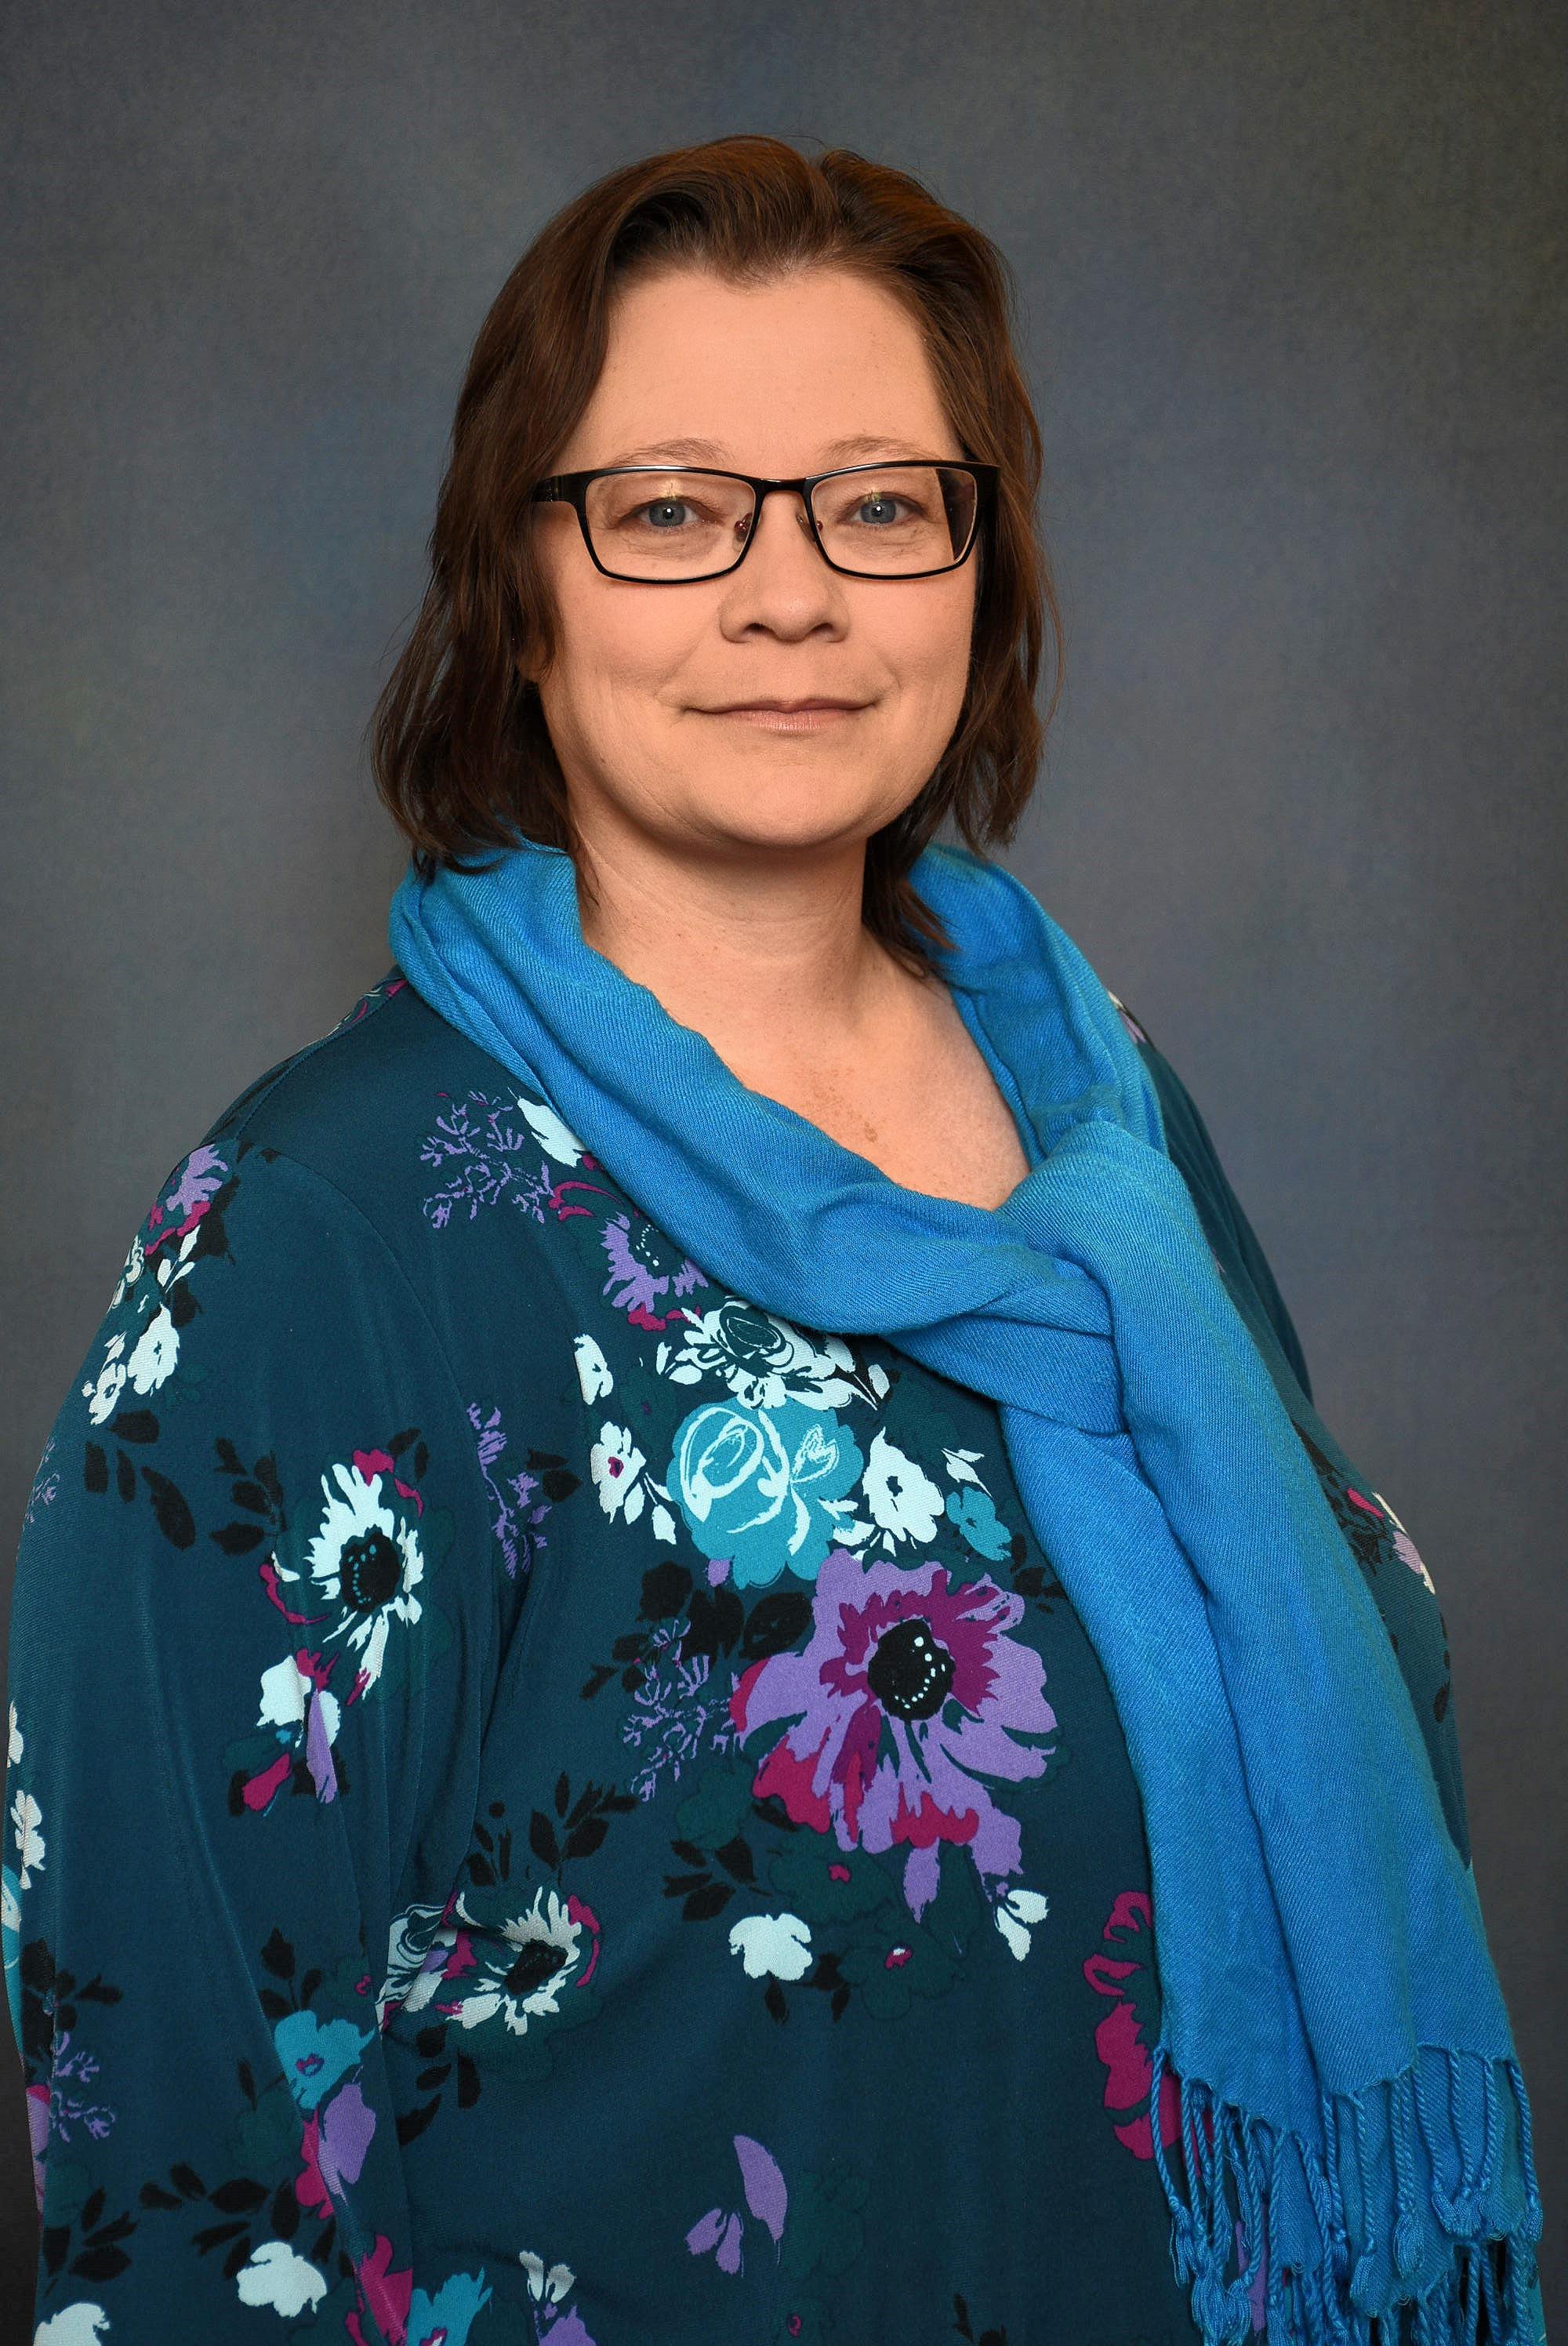 Angela Wilkes